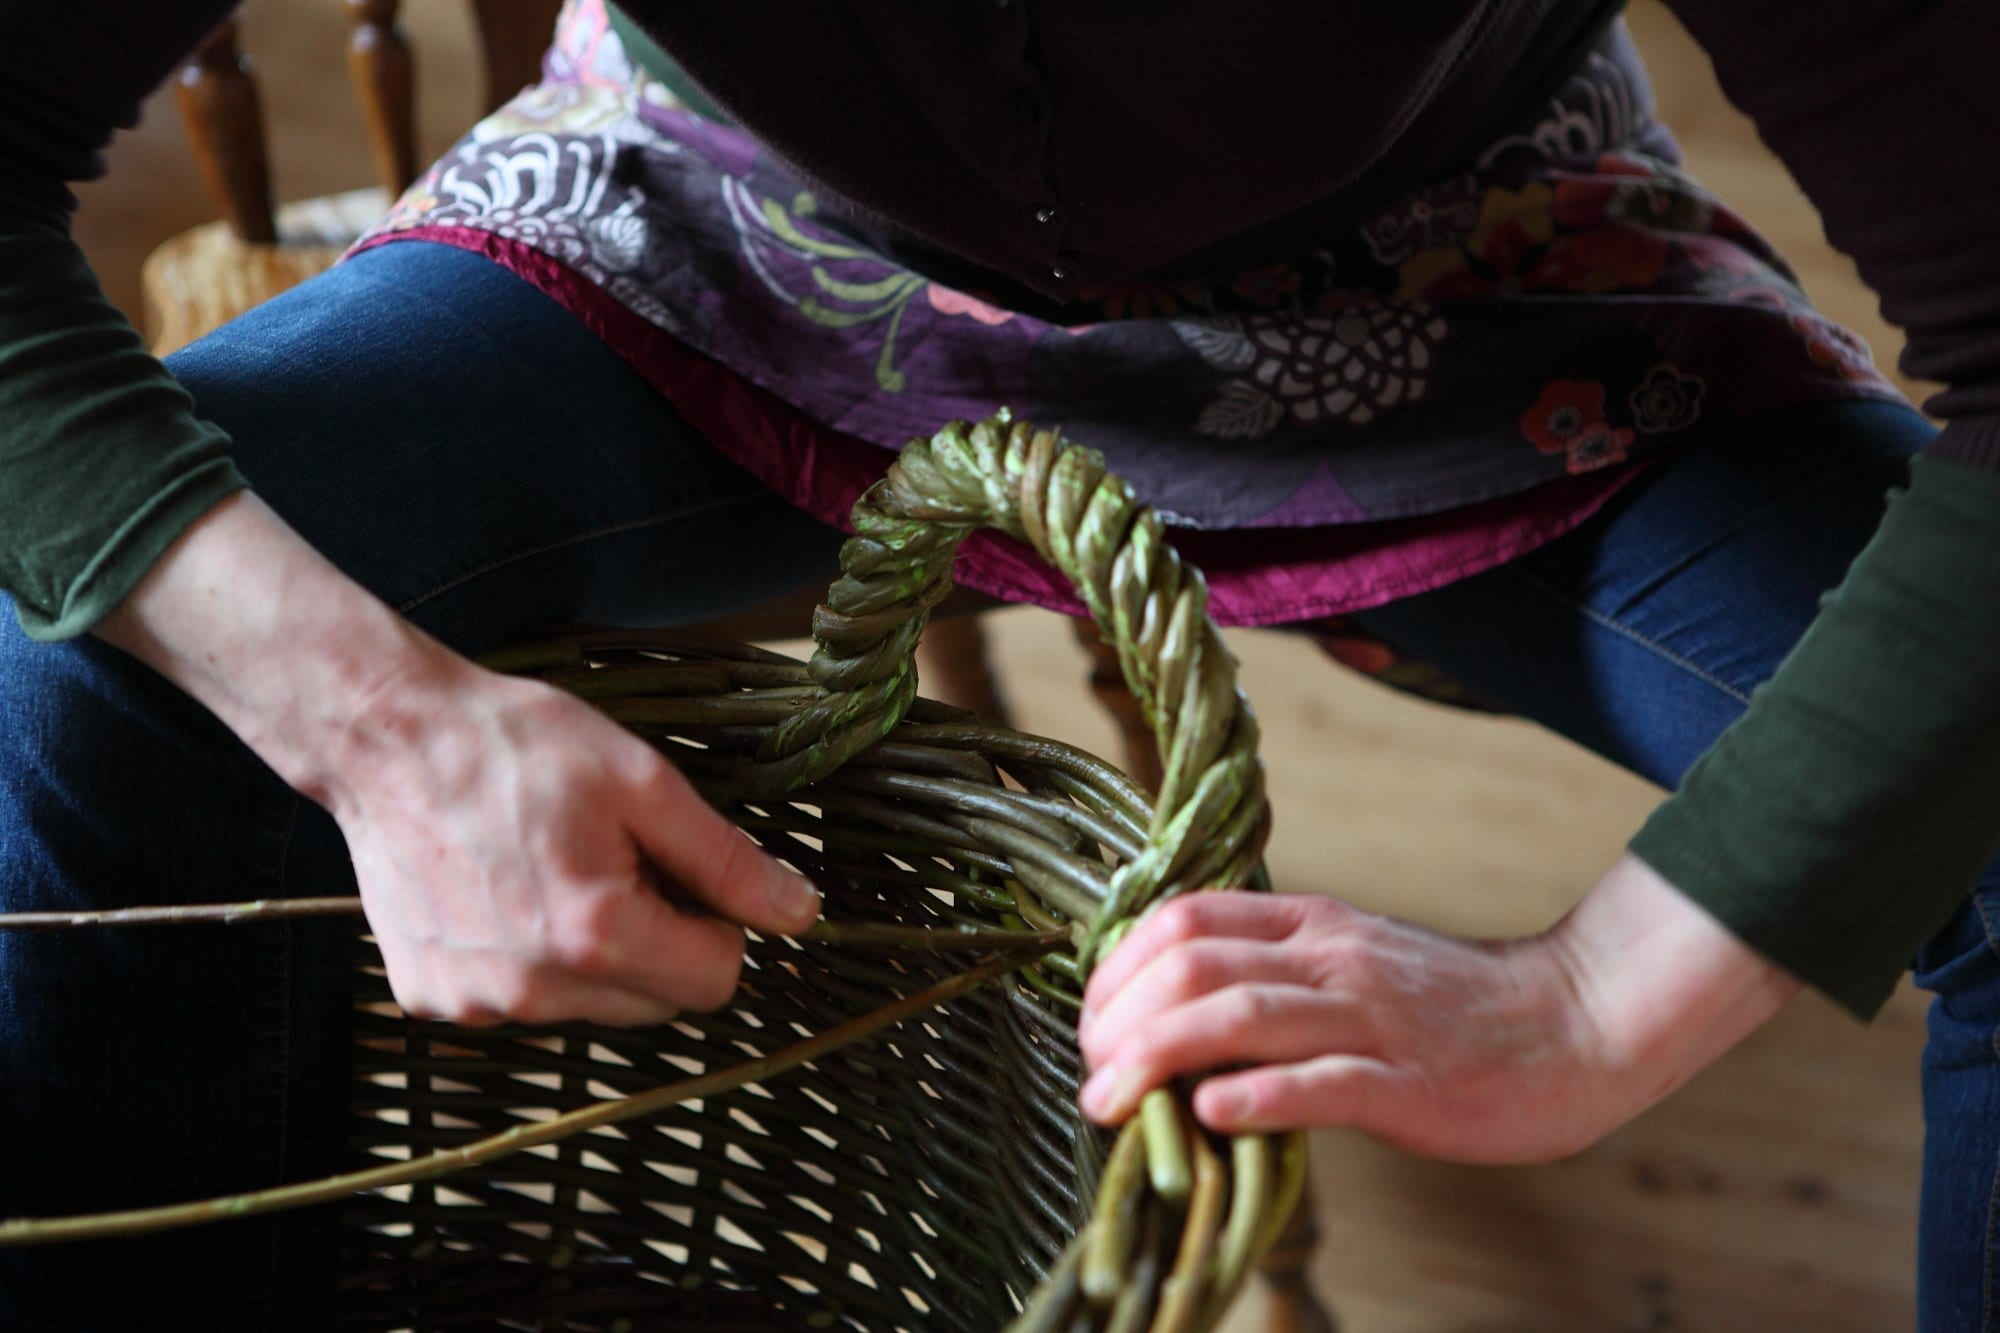 Hanna twisting a handle while making a basket